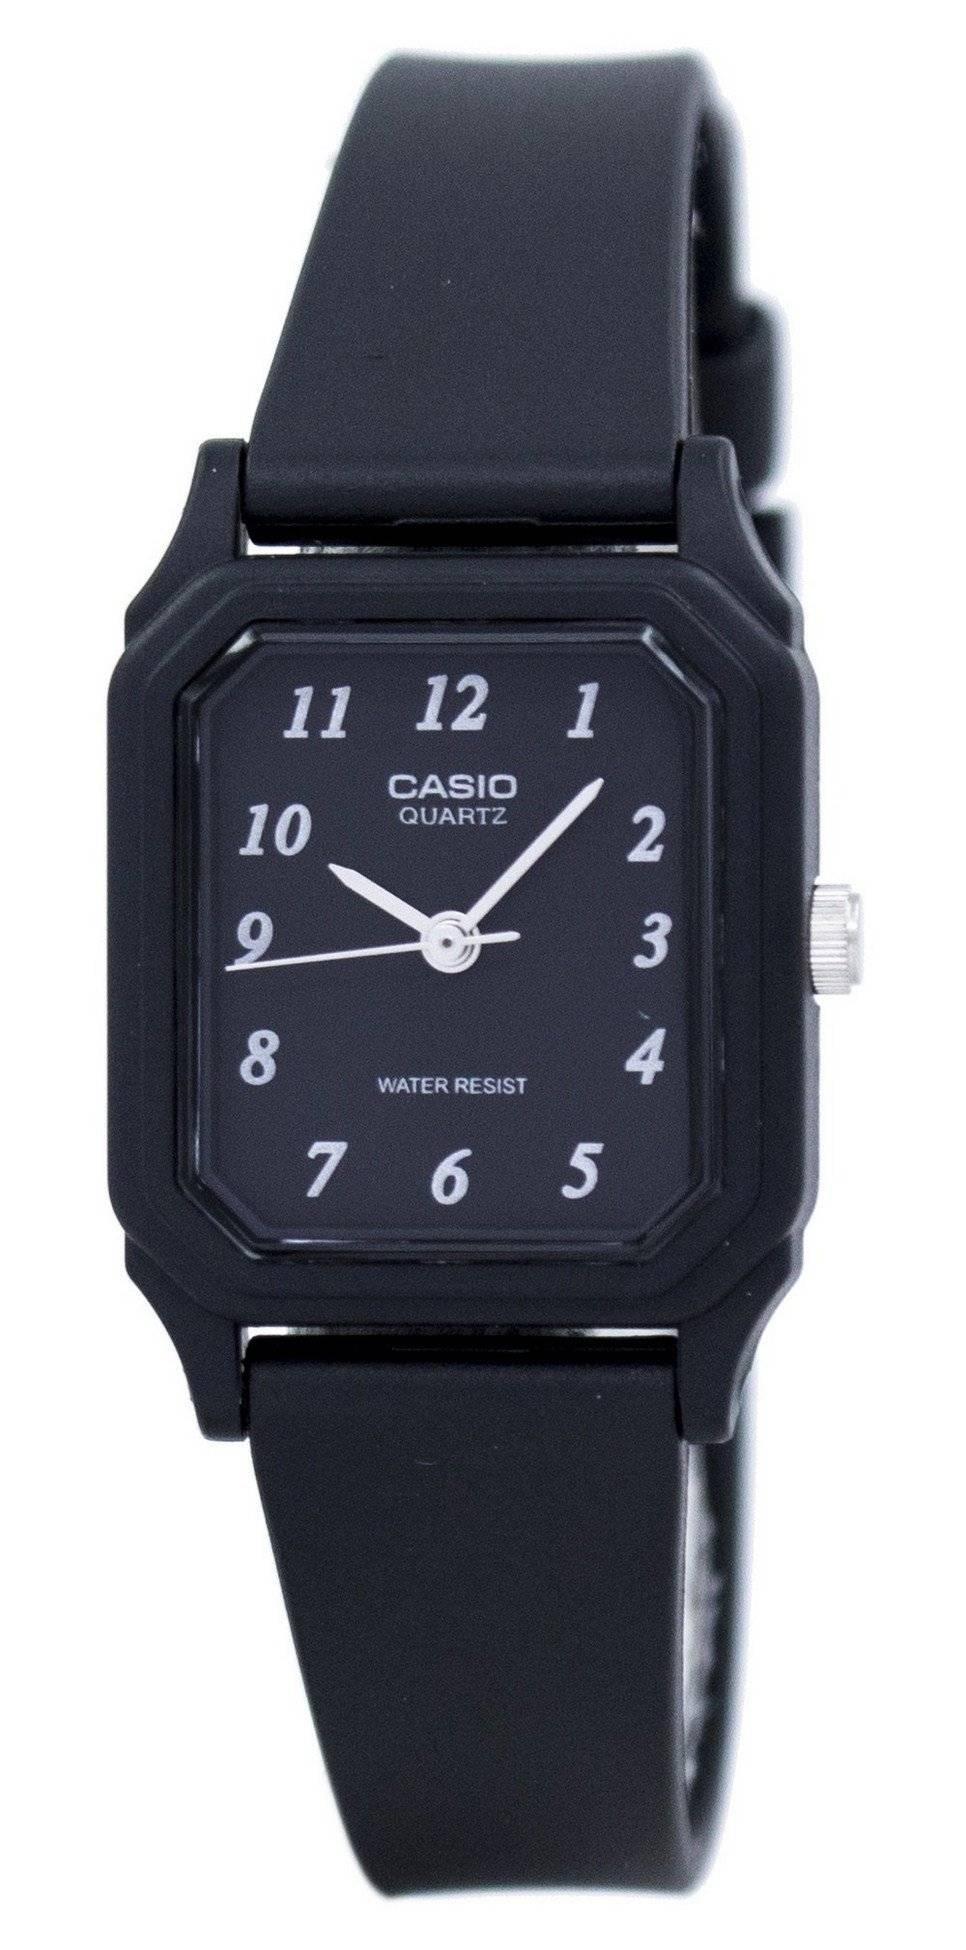 a23f0dd4609f Reloj Casio analógico cuarzo LQ-142-1B LQ142-1B Femenil es